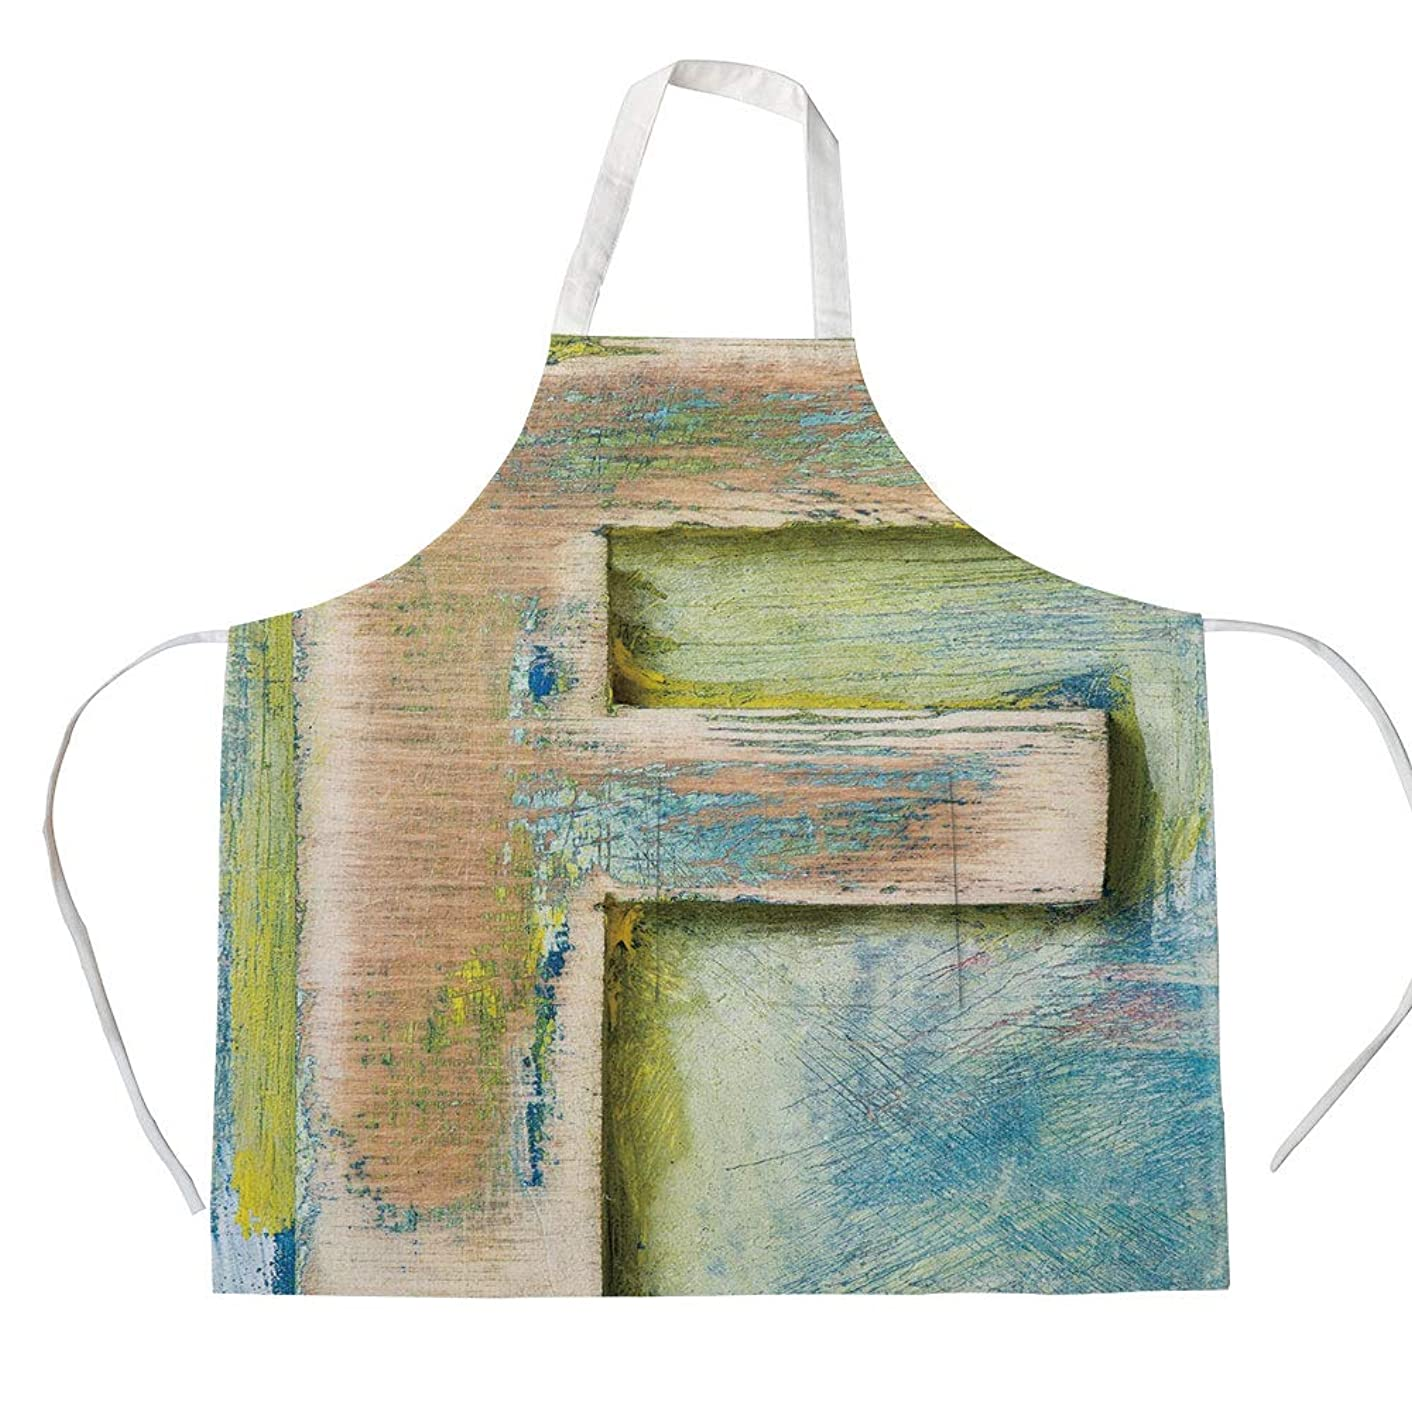 Cotton Linen Apron,Two Side Pocket,Letter F,Damaged Worn Uppercase F Printing Symbol Antique Letterpress Block Typeface Decorative,Green Blue Tan,for Cooking Baking Gardening